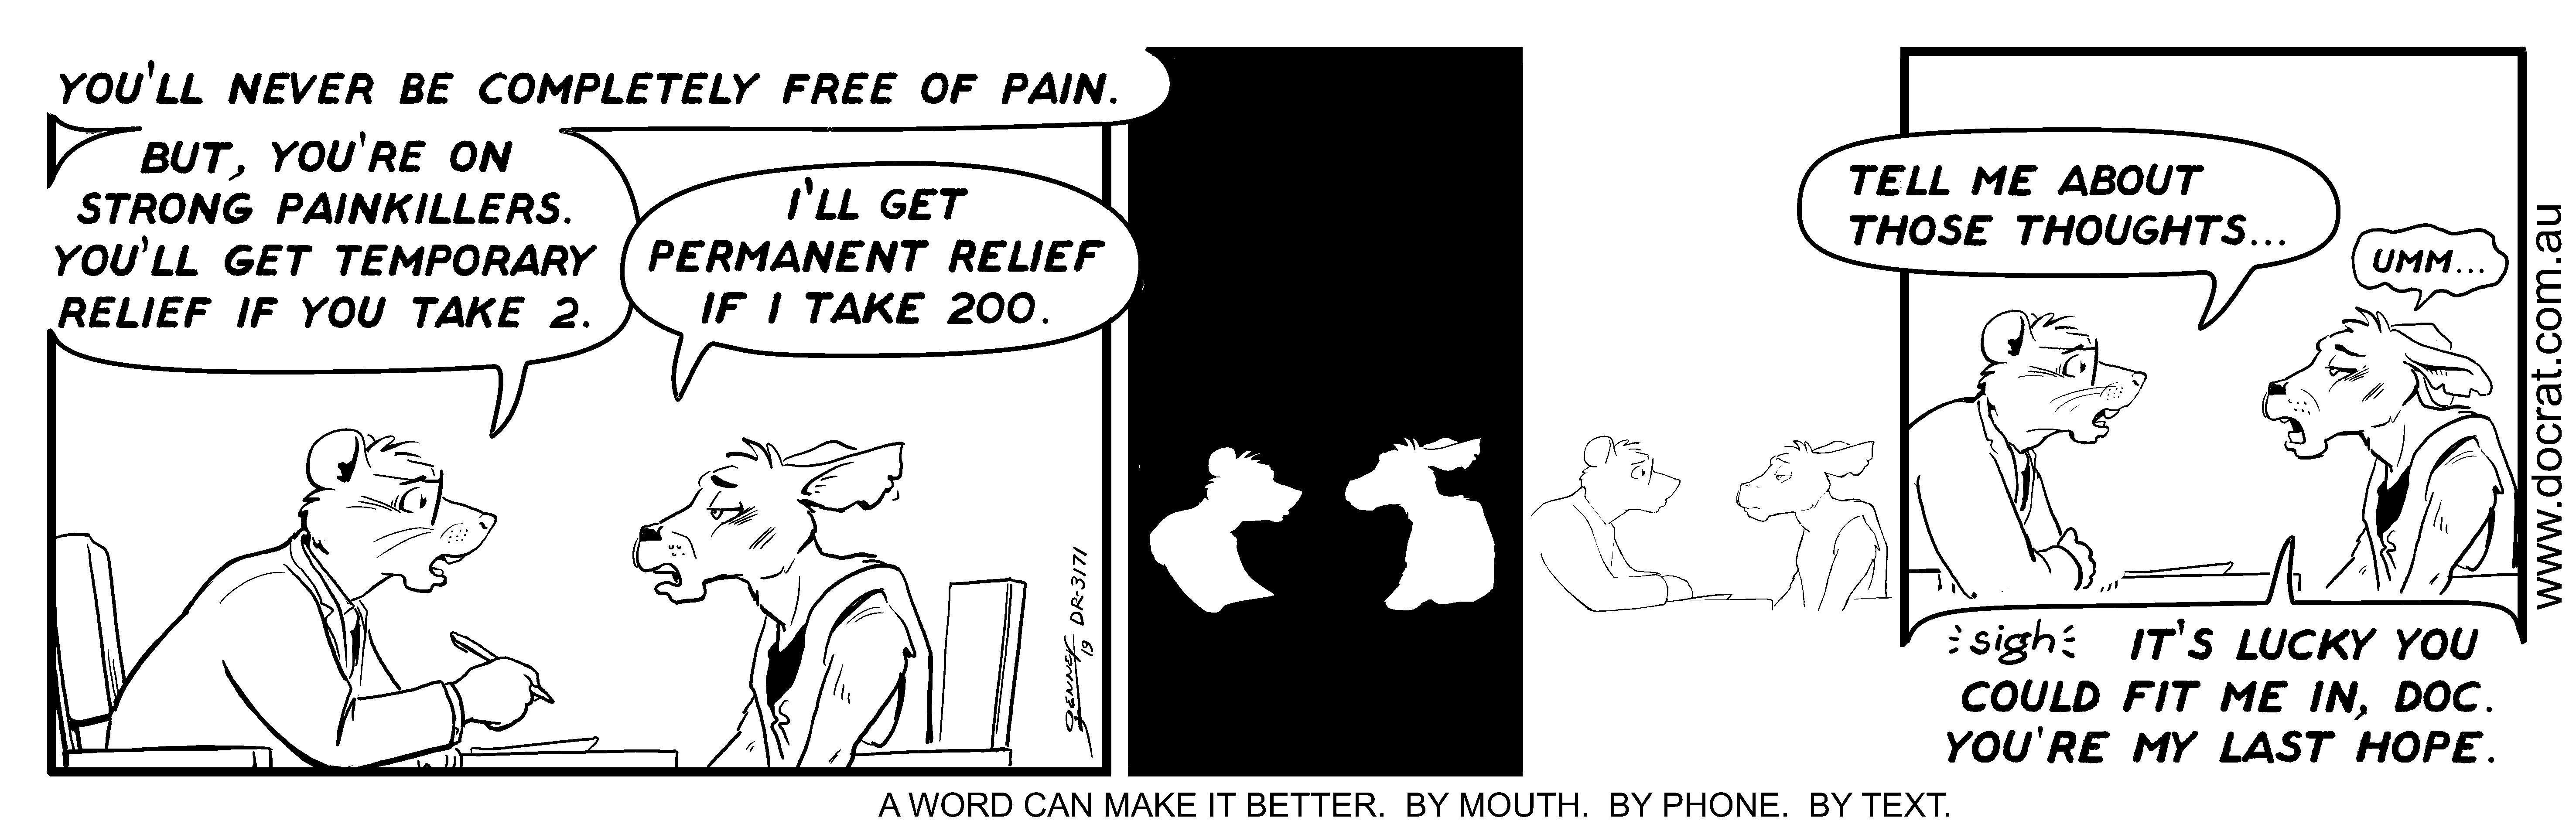 20190204